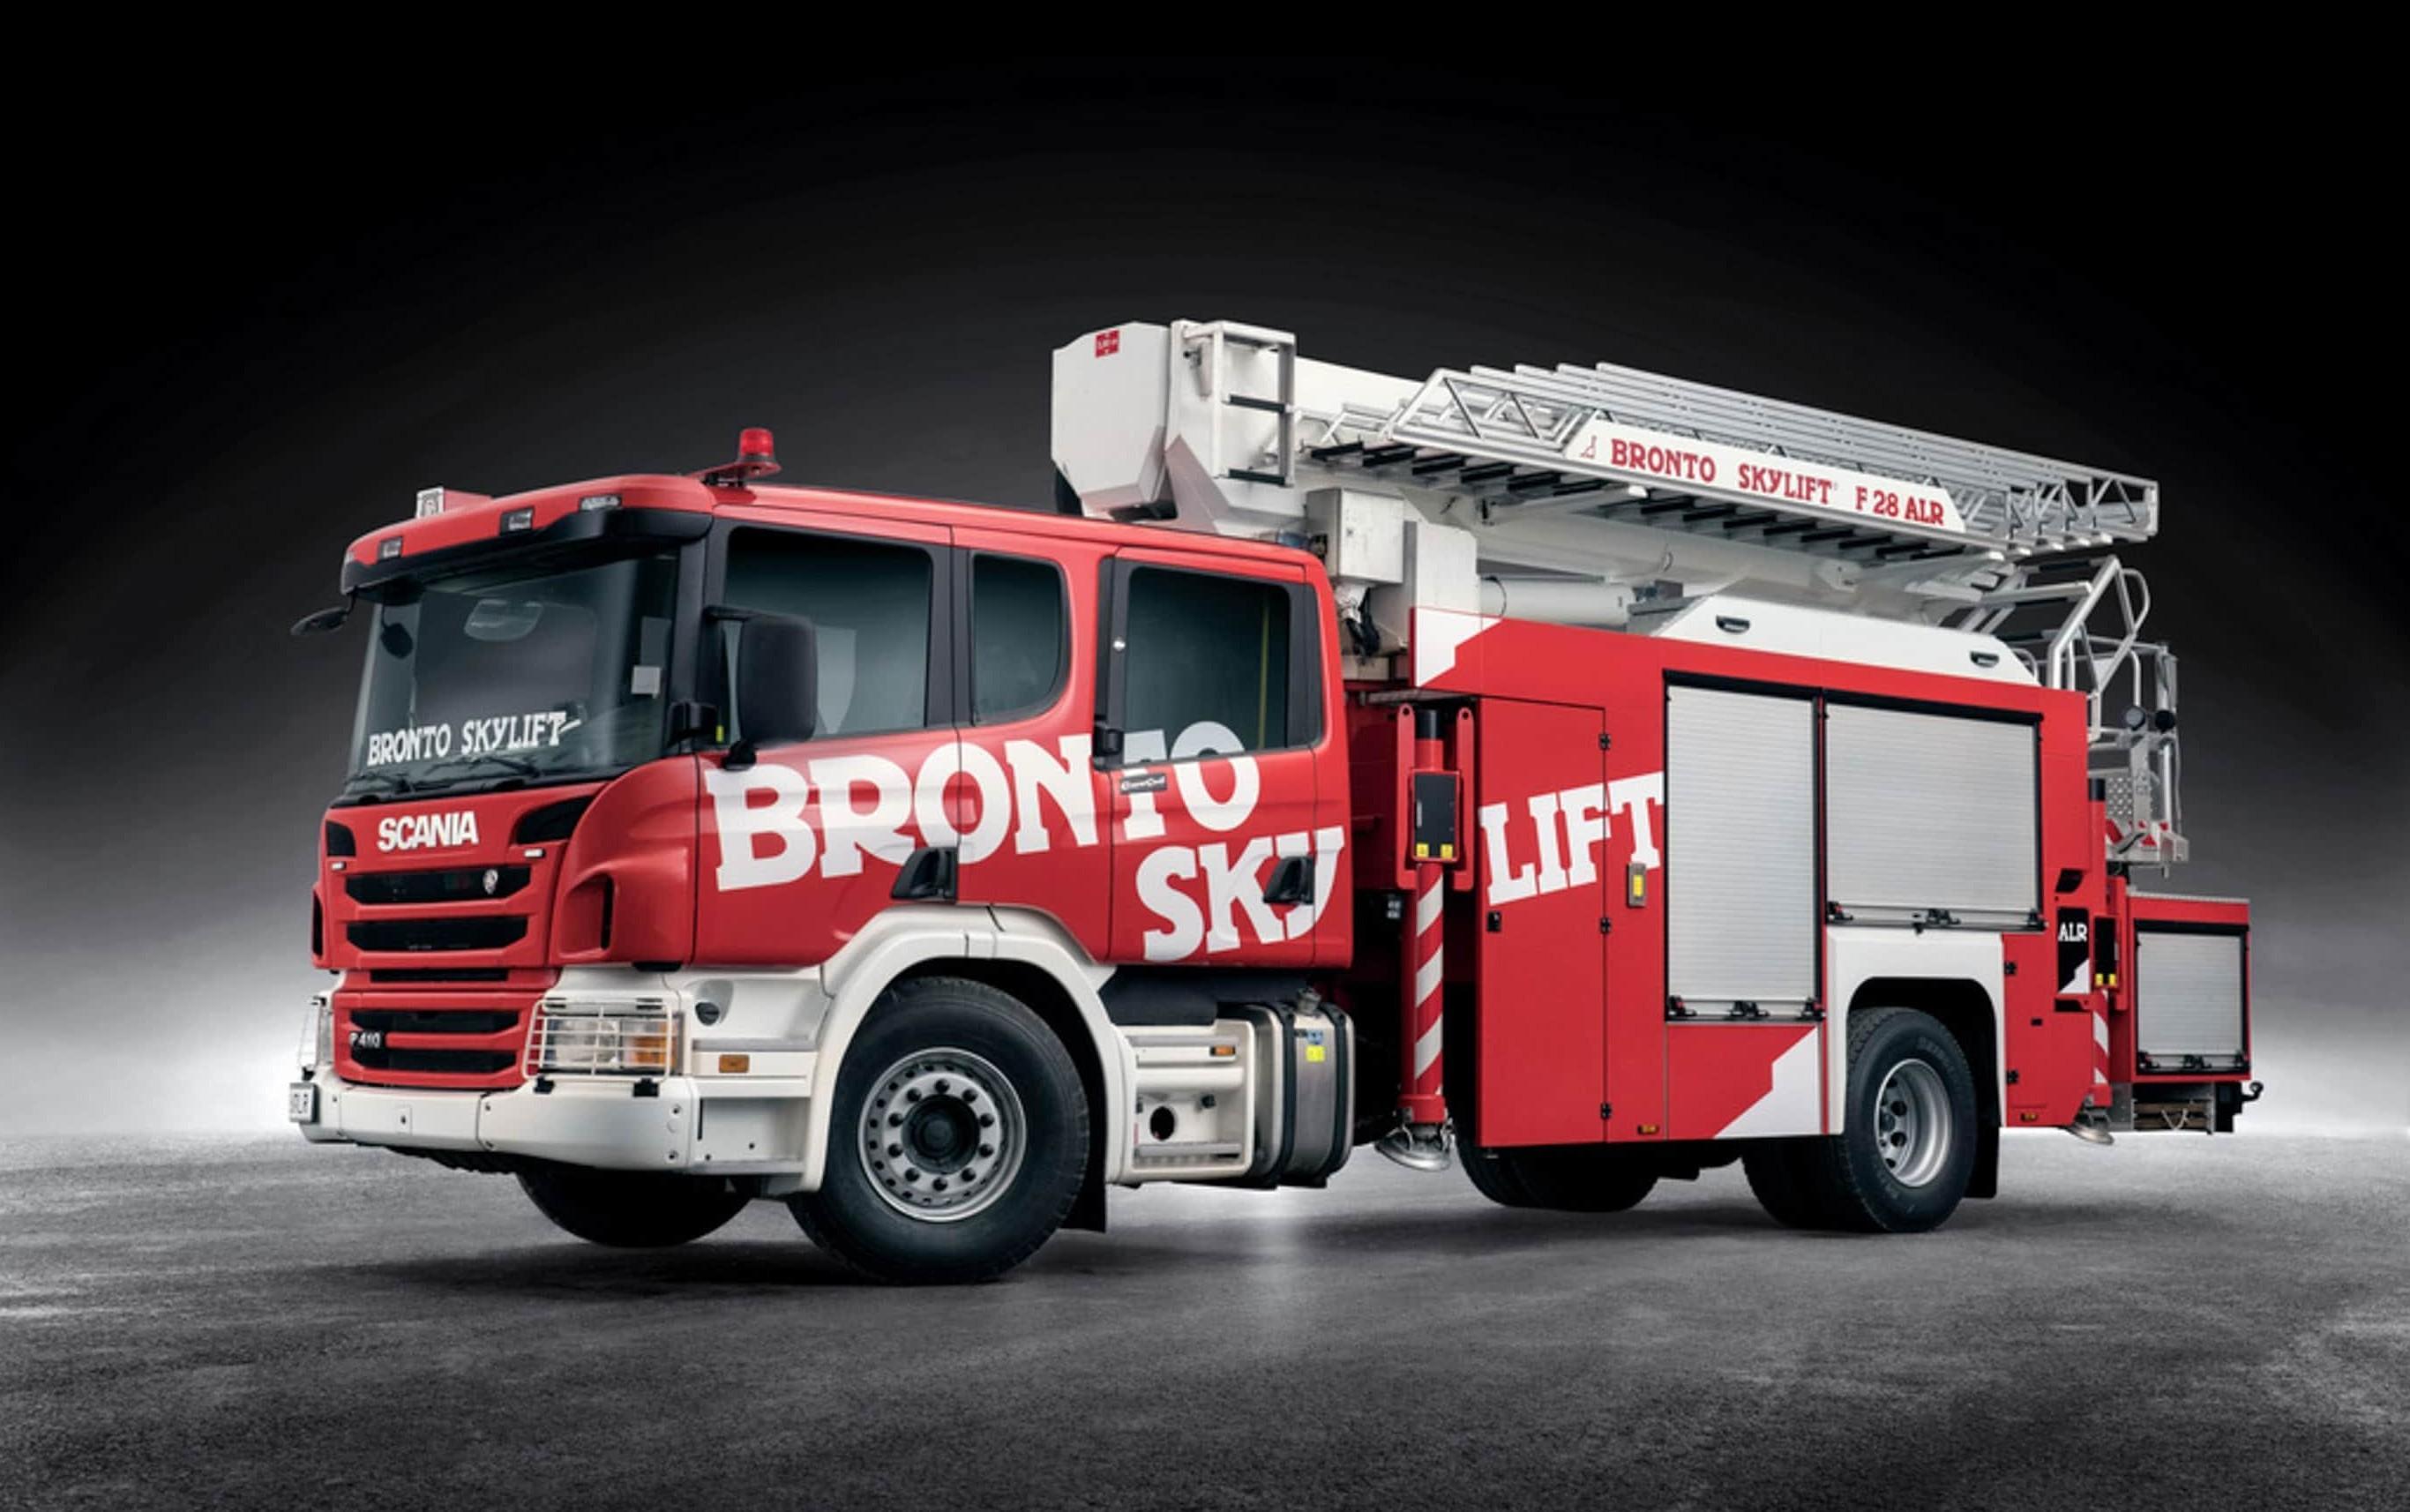 Bronto Skylift F28ALR aerial ladder platform